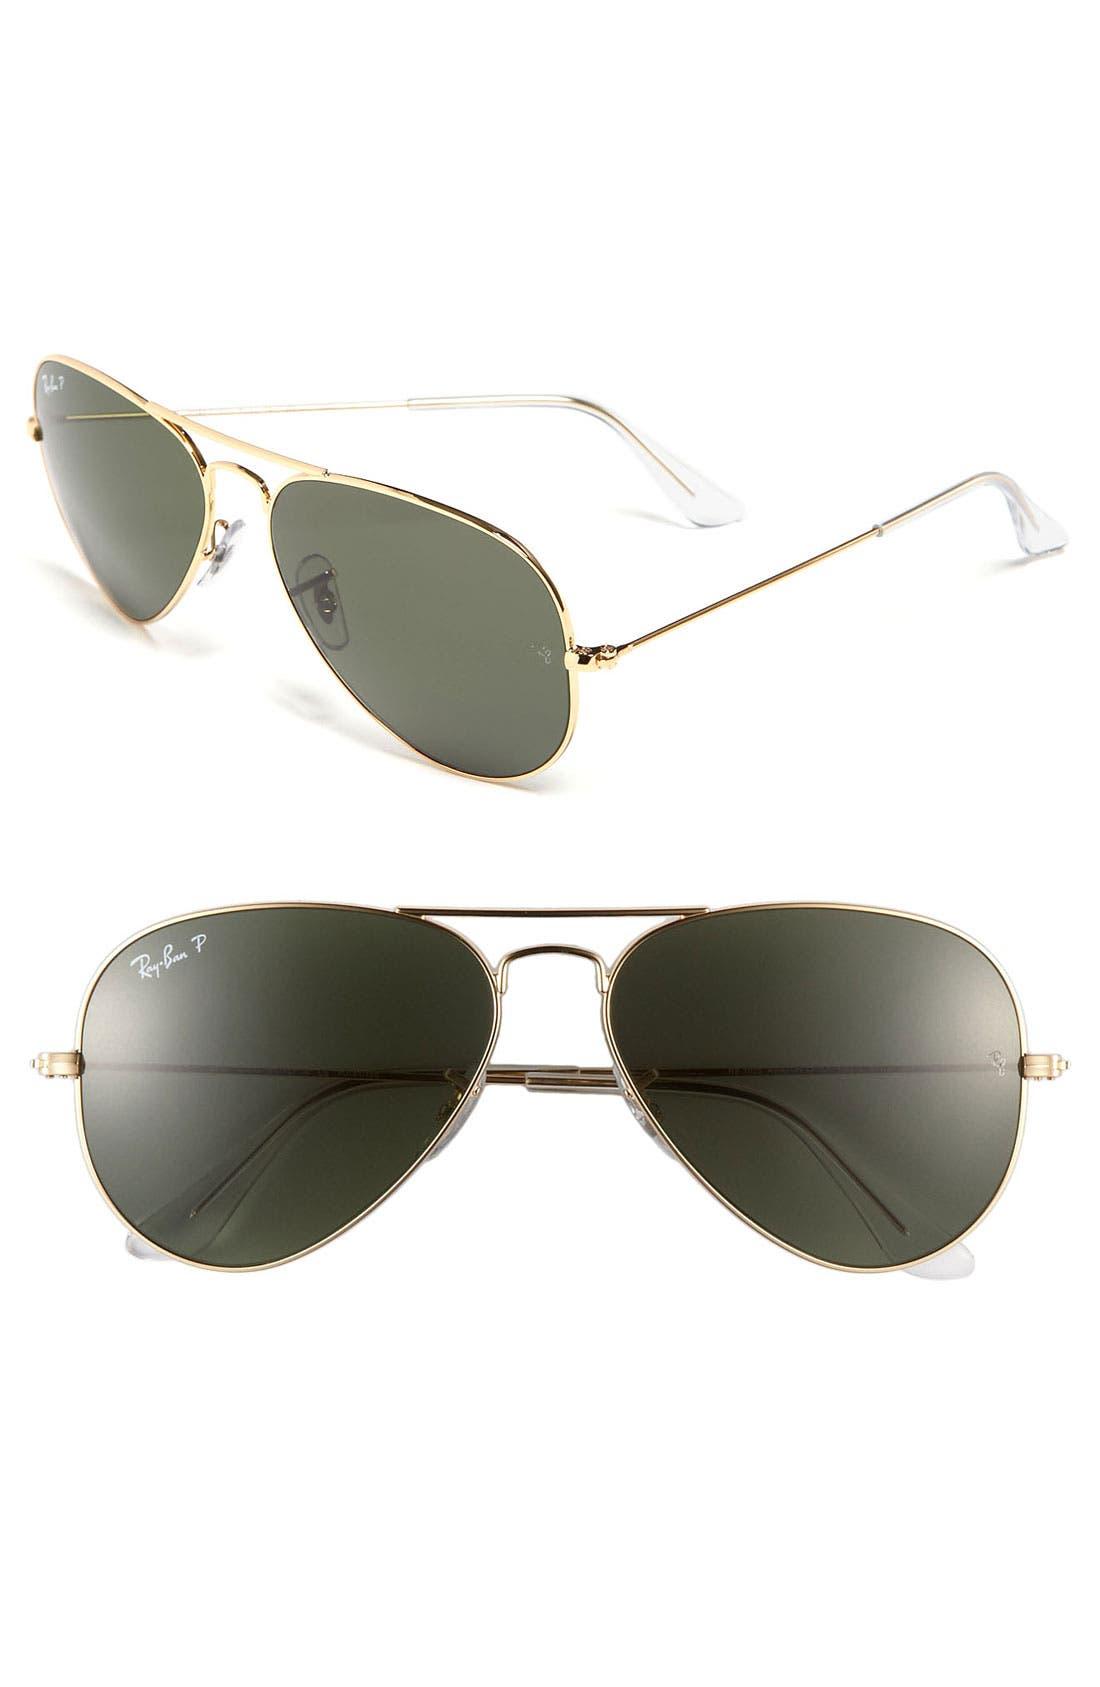 Ray-Ban Original 5m Aviator Sunglasses -